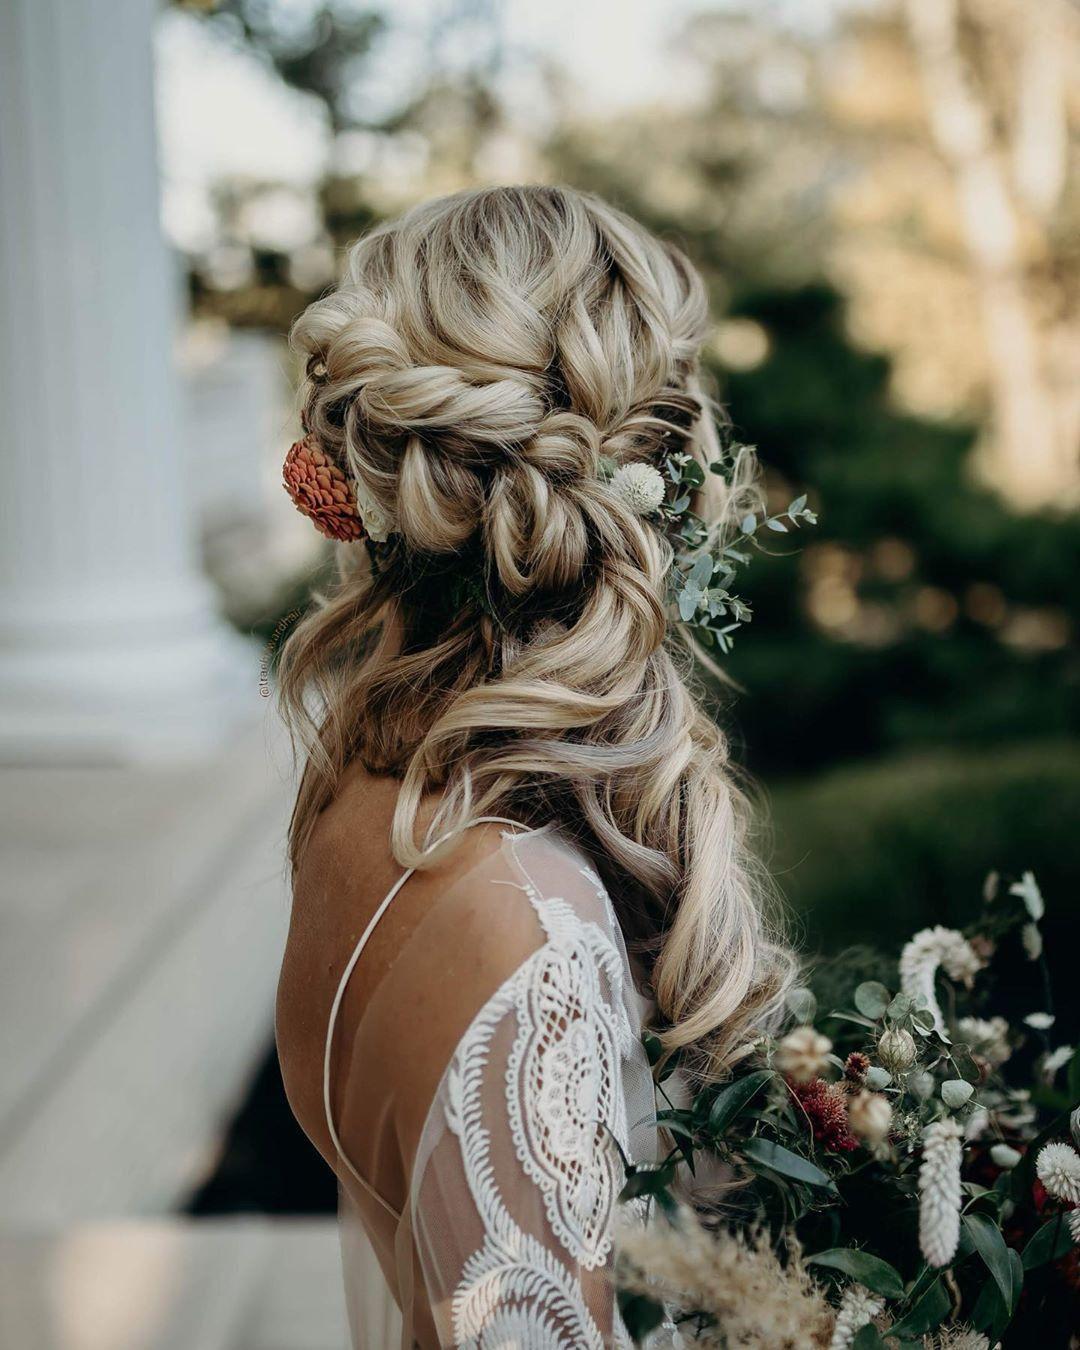 labude brautmode köln - boho bridal hairstyle - half updo